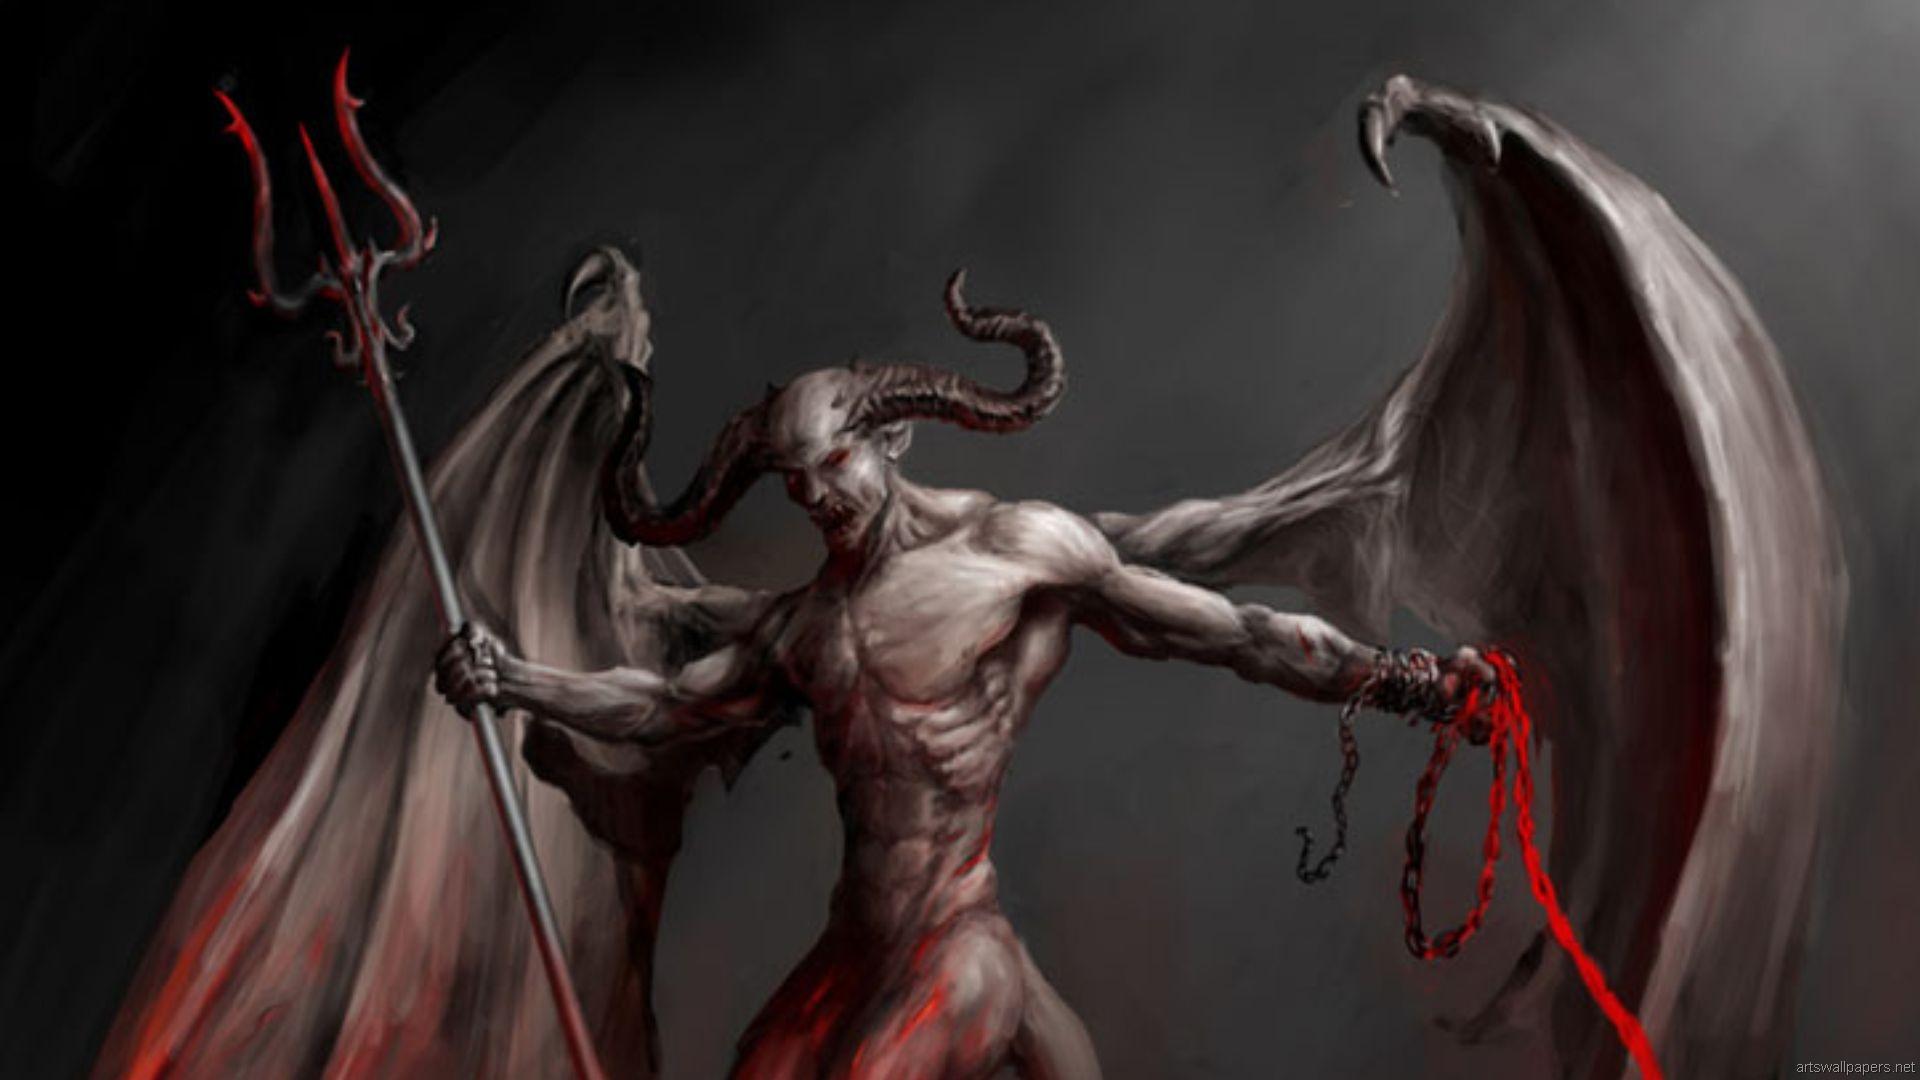 Dark Demon Wallpaper 1920x1080 Dark Demon 1920x1080